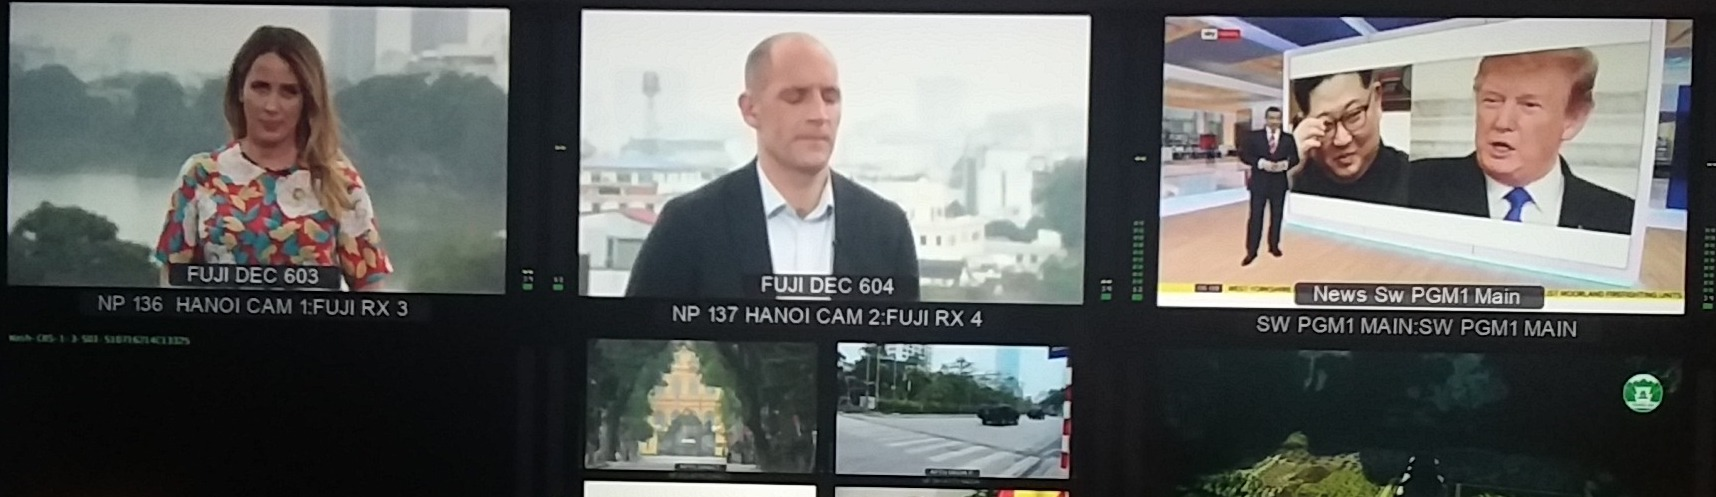 live broadcasting hanoi vietnam